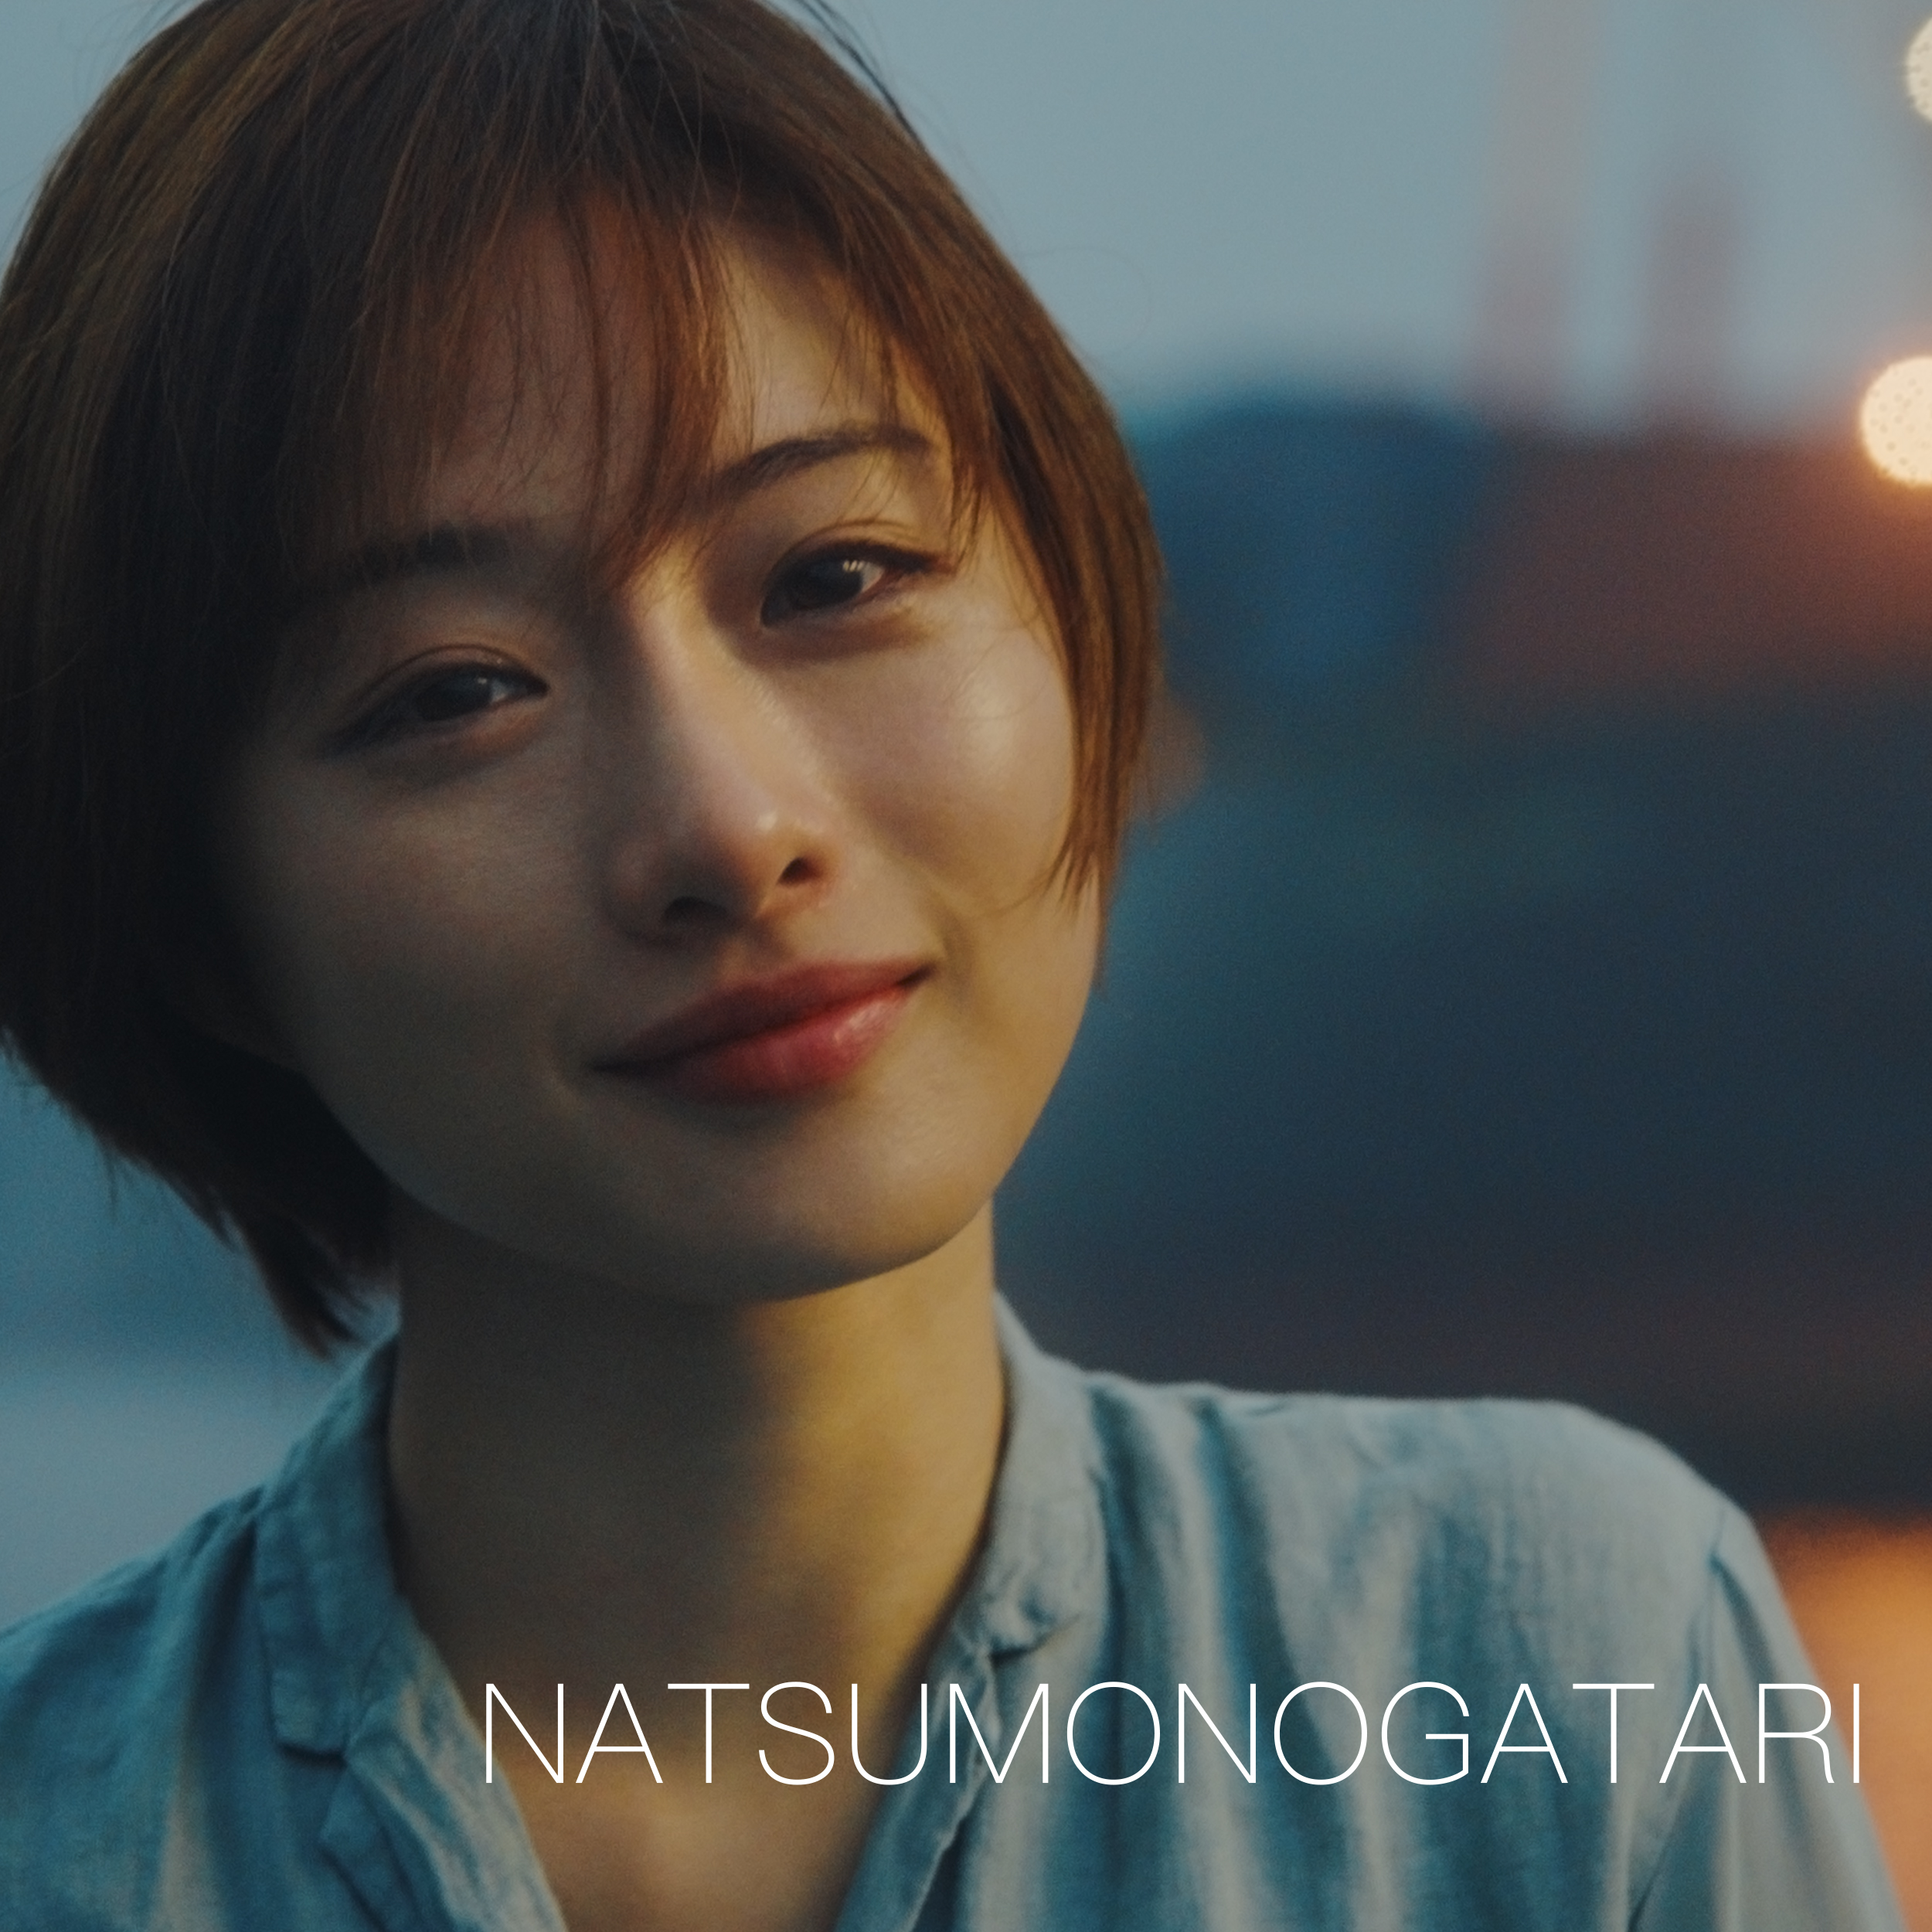 「NATSUMONOGATARI」ジャケット